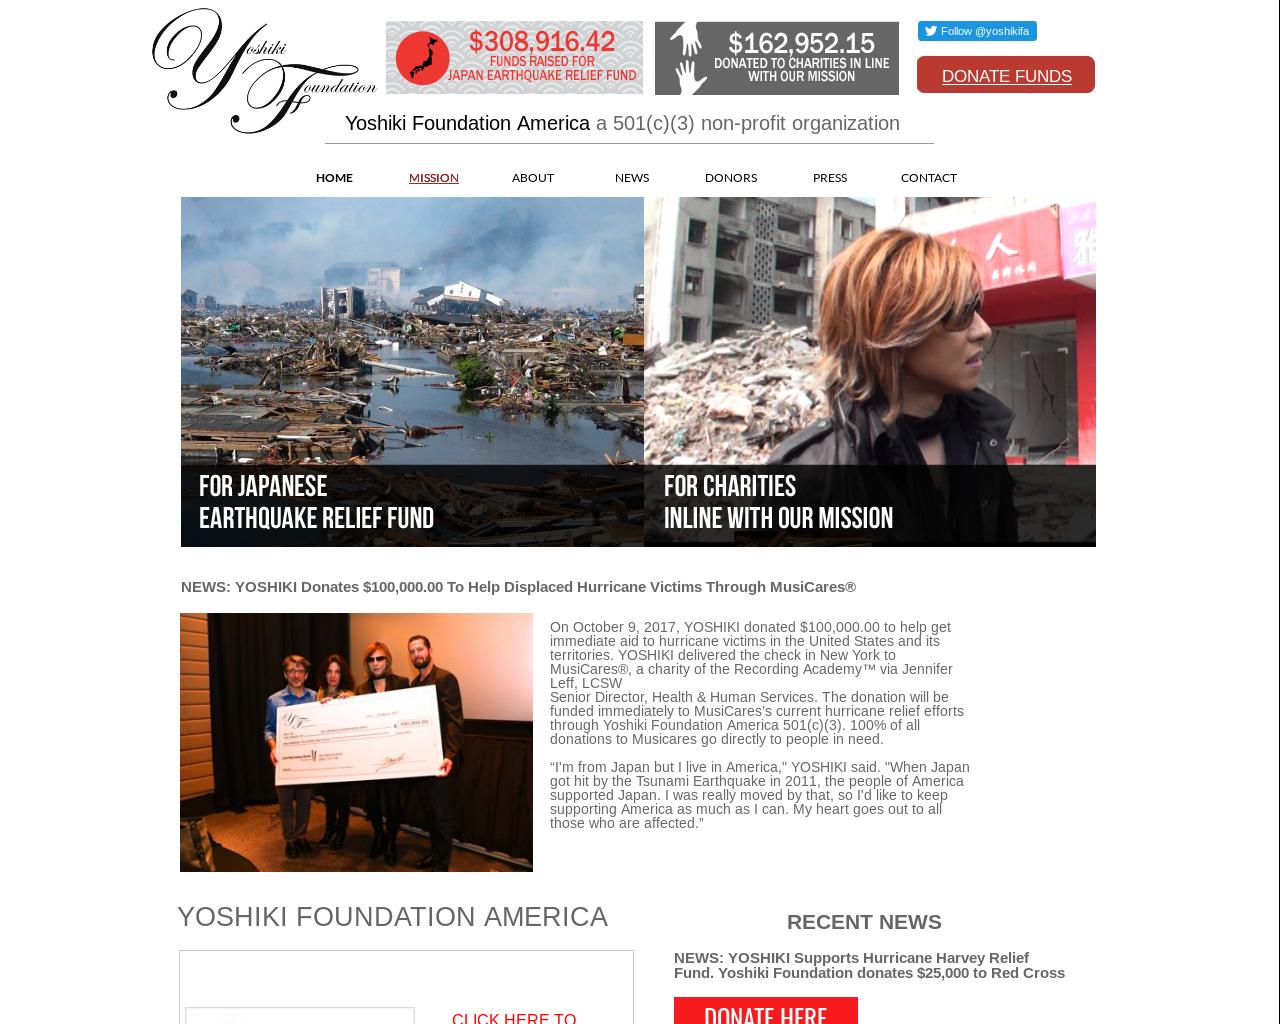 www.yoshikifoundationamerica.org(2018/01/13 09:10:41)